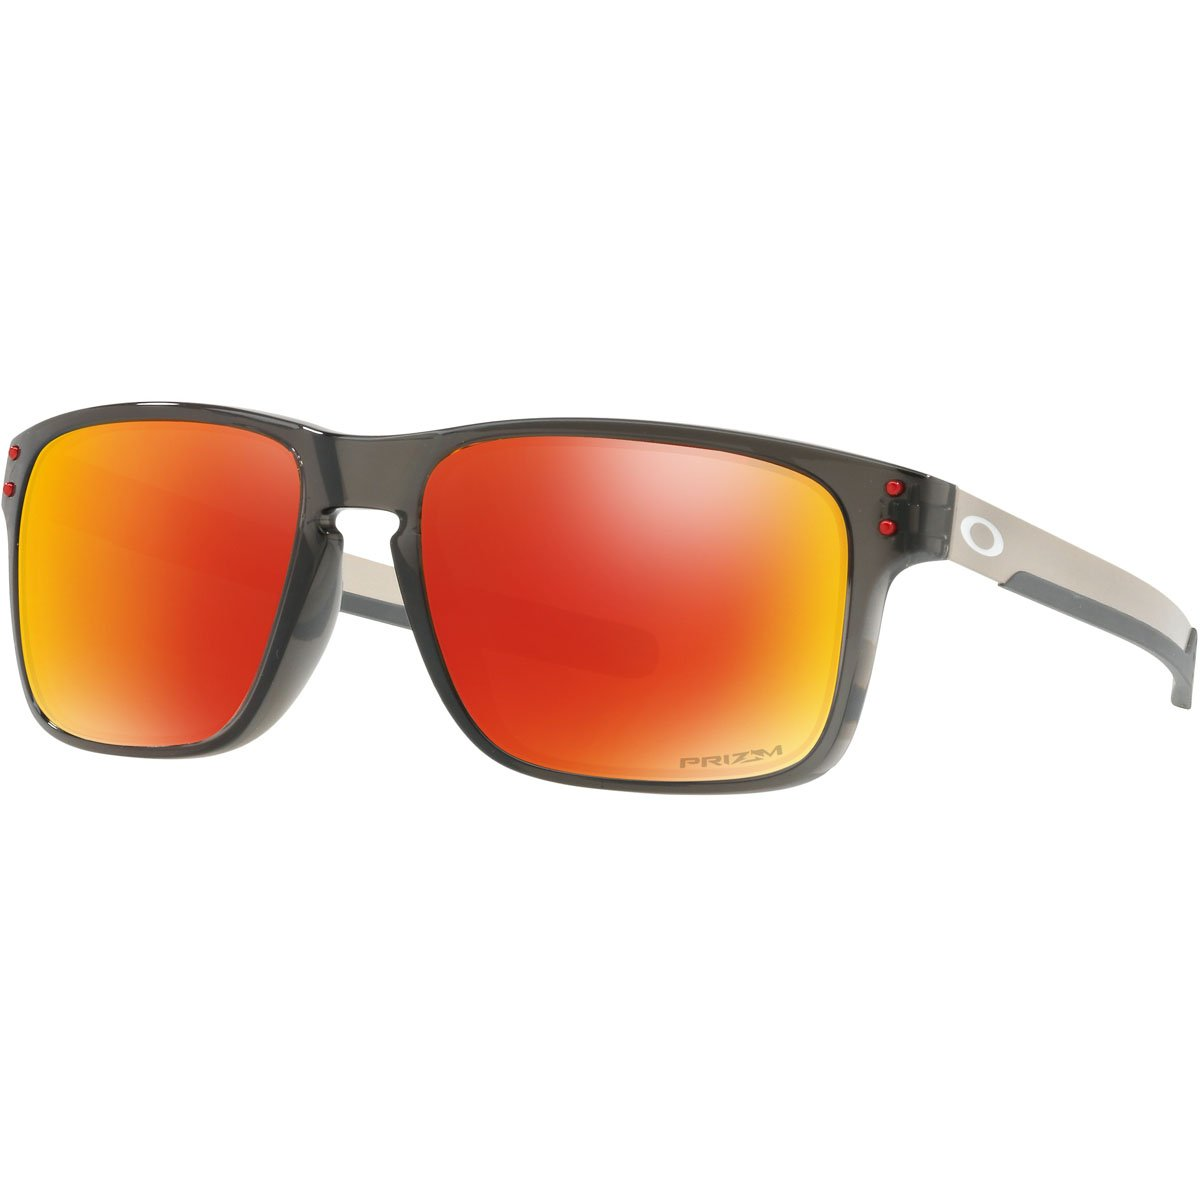 Amazon.com: Oakley Holbrook - Gafas de sol para hombre, Gris ...